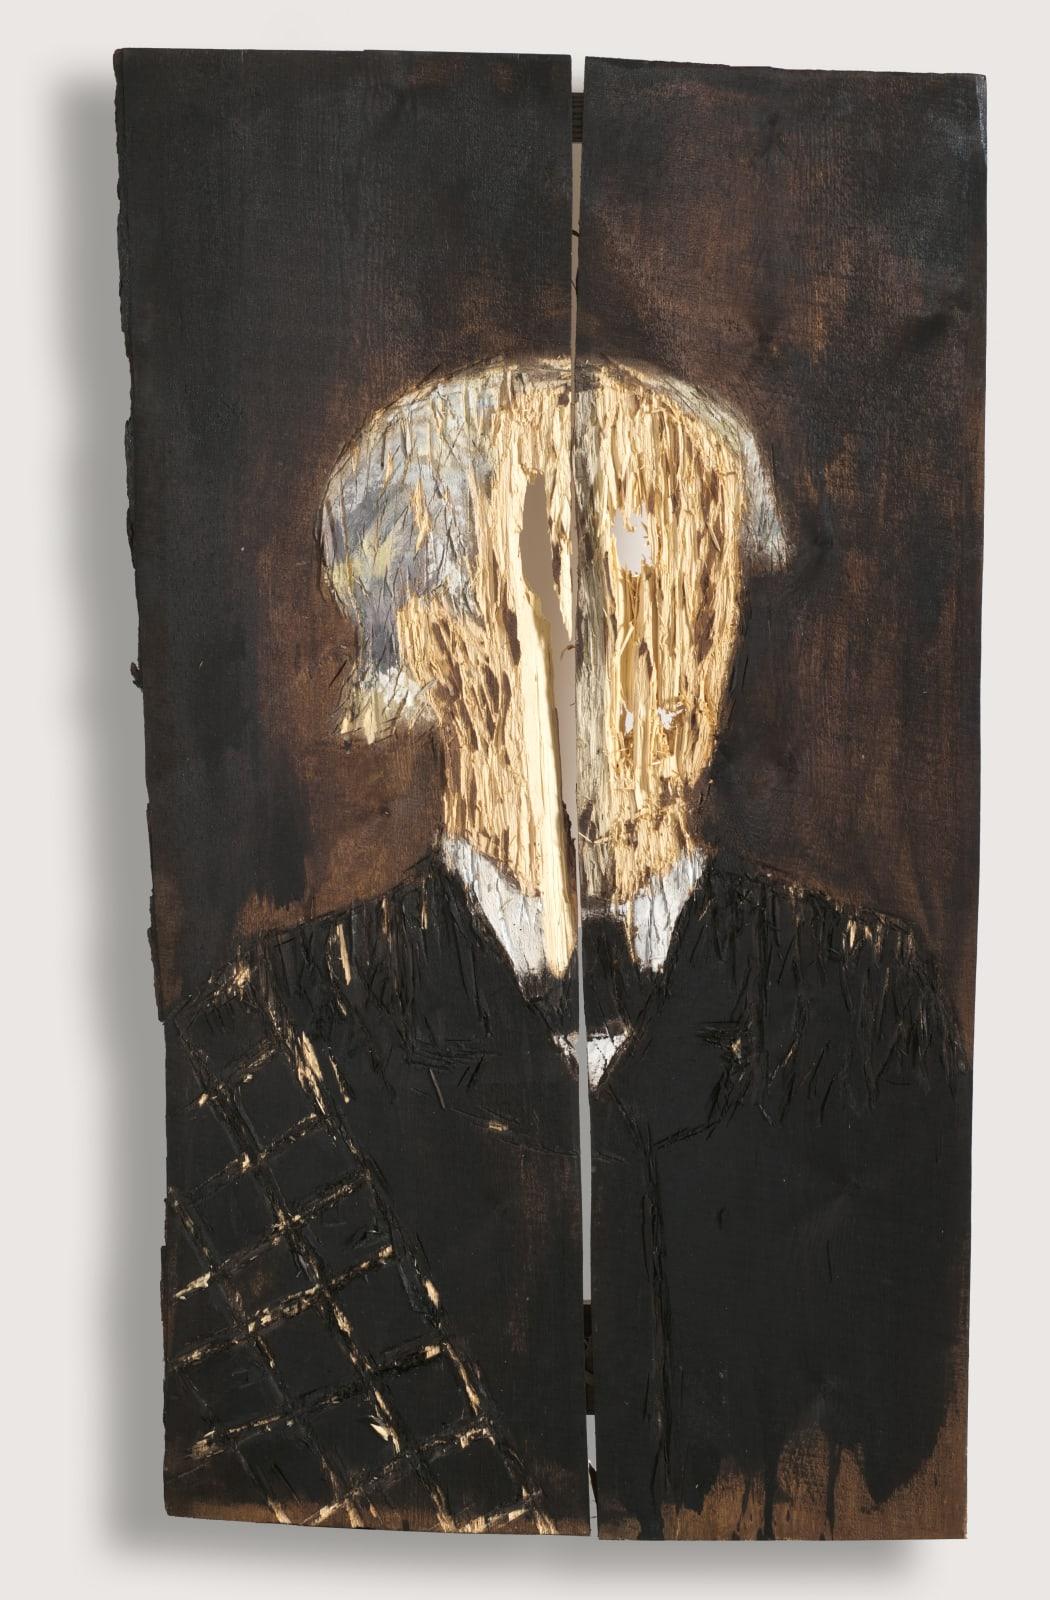 Nestor Engelke Wooden portrait of Fedor Tyutchev from the series